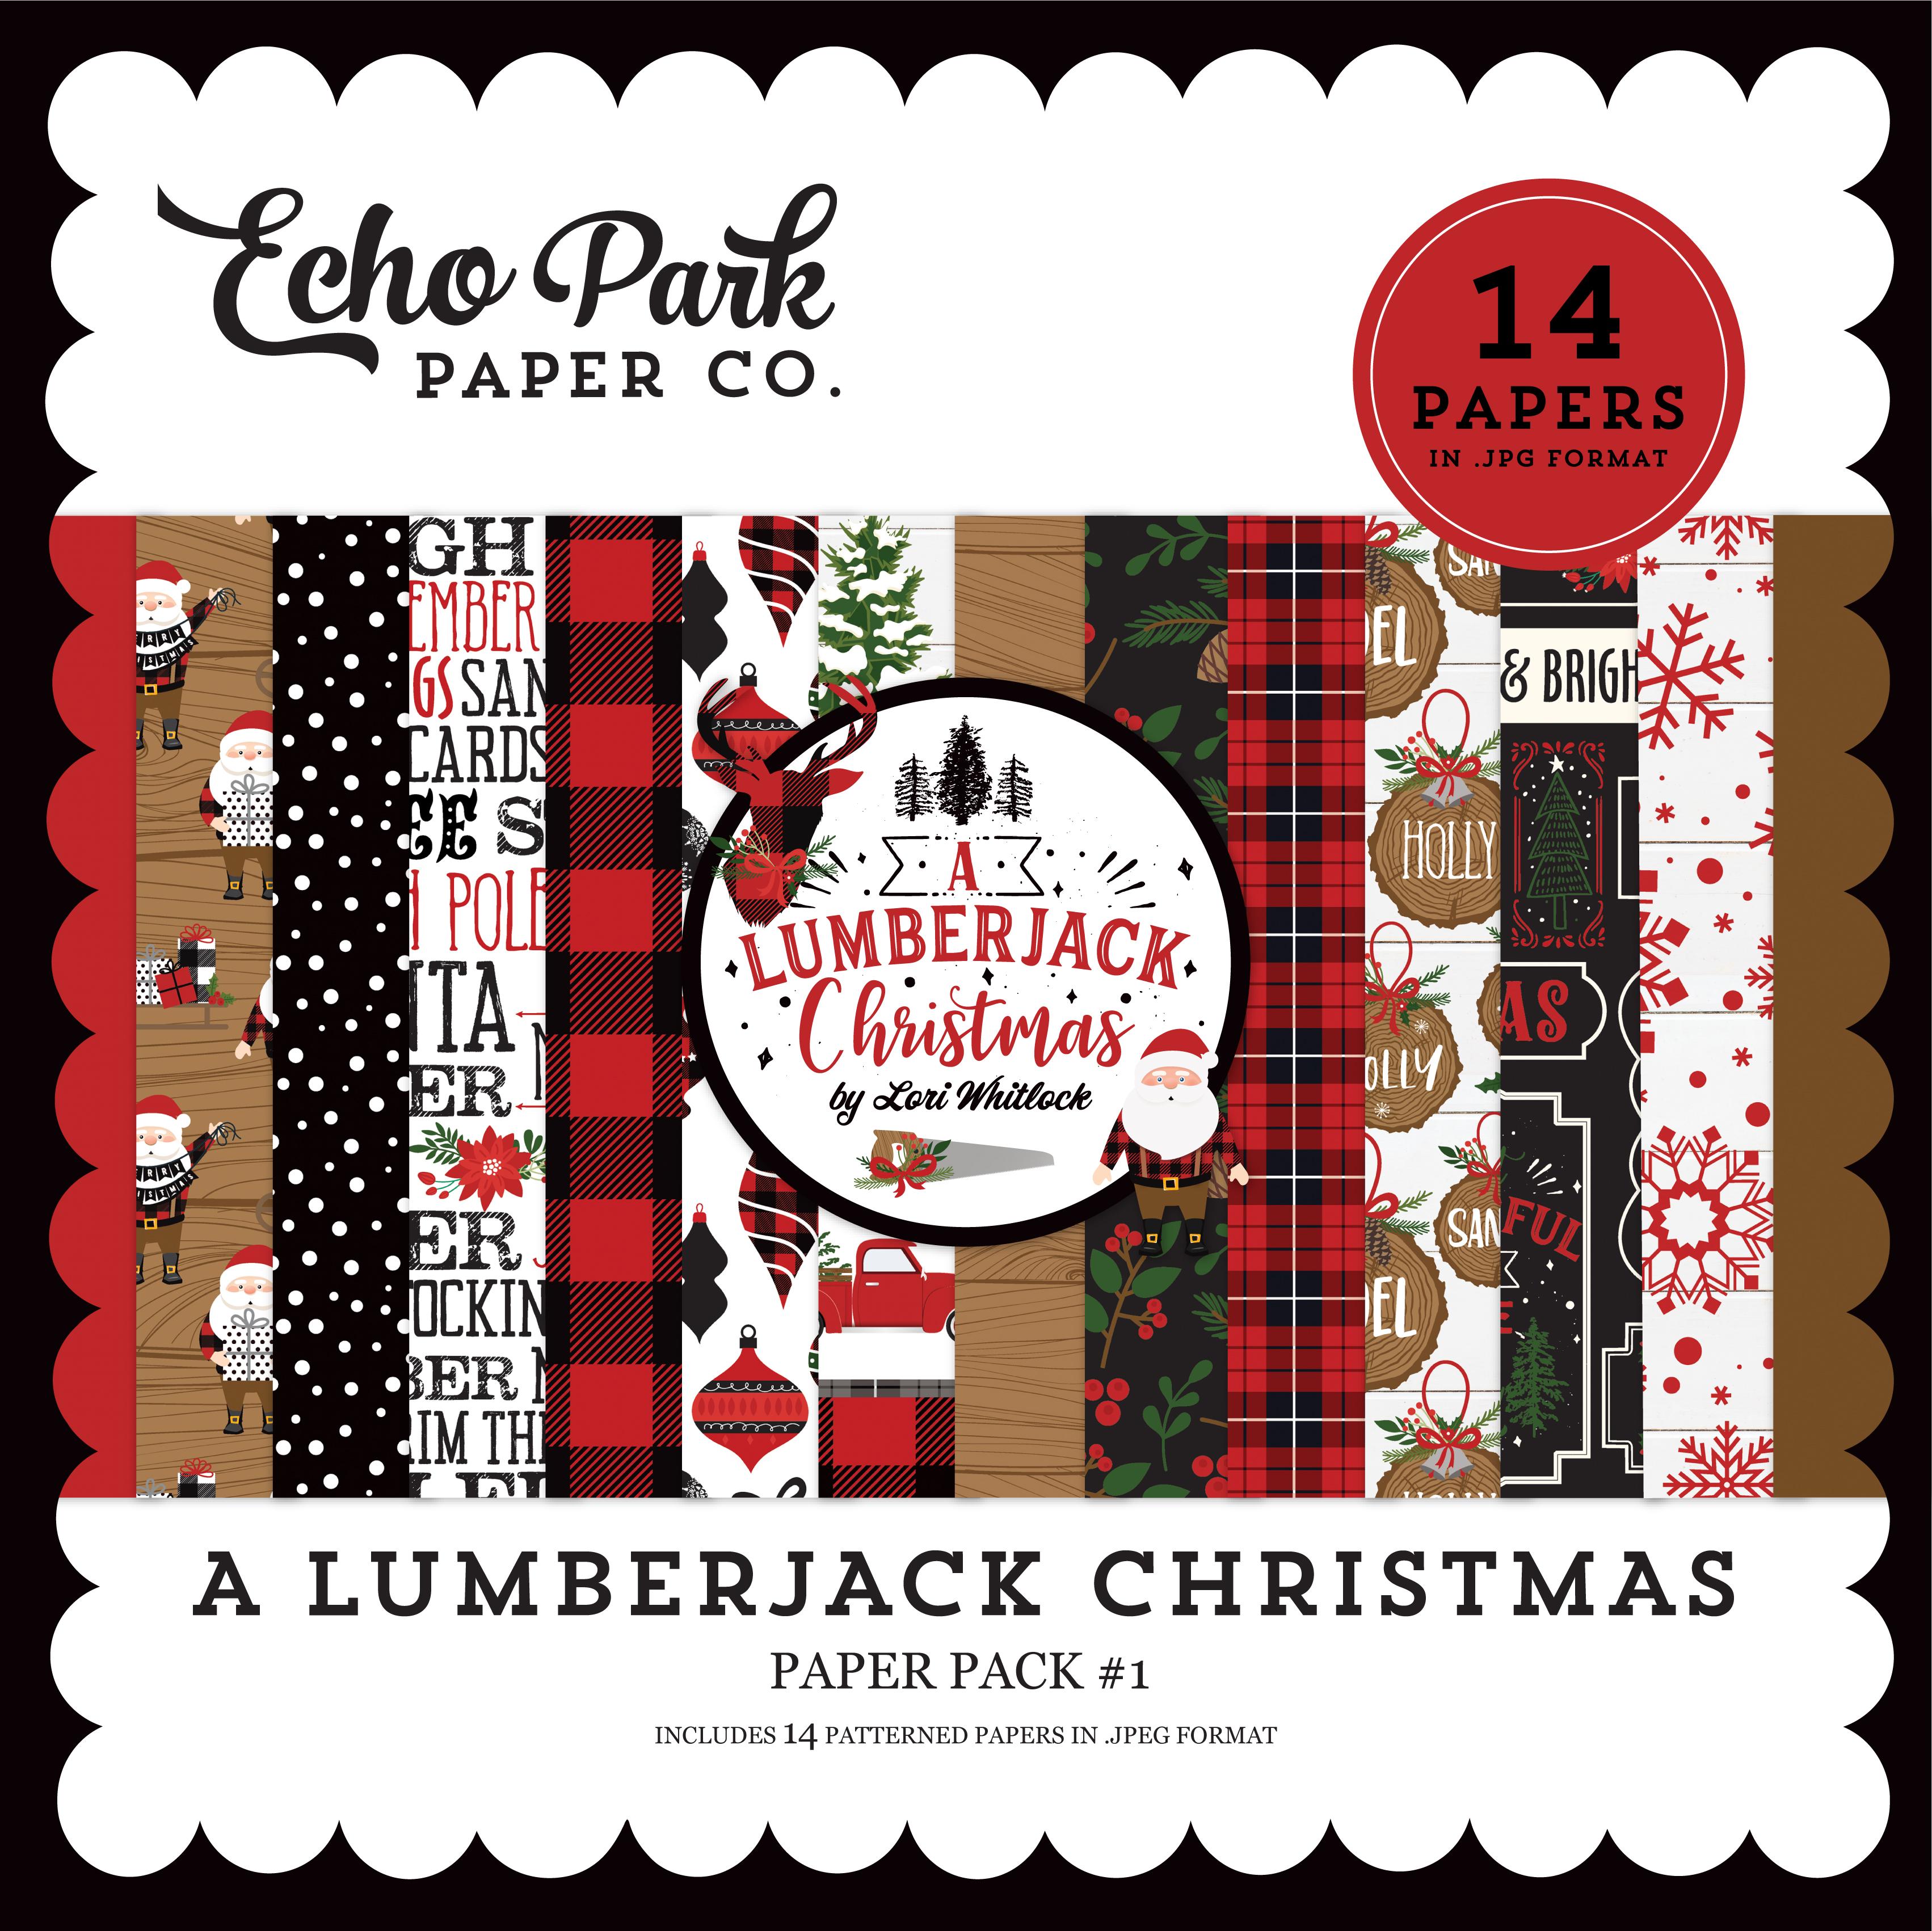 A Lumberjack Christmas Paper Pack #1